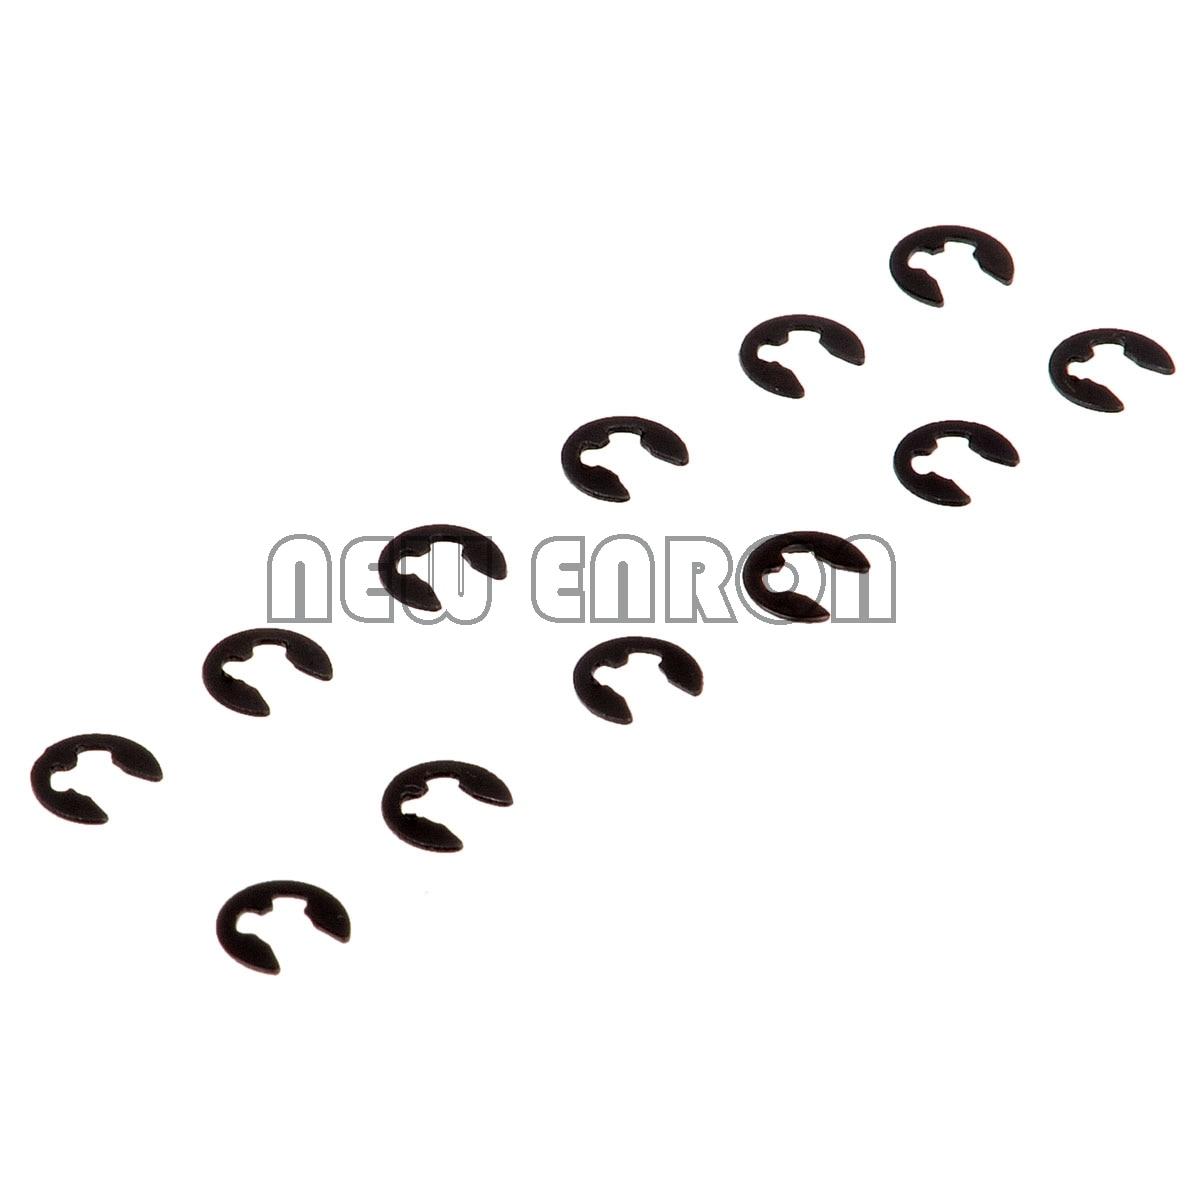 NEW ENRON E-Clip 2.5 02037 HSP Spare Parts For 1/10 R/C Model Car 1:10 HSP02037